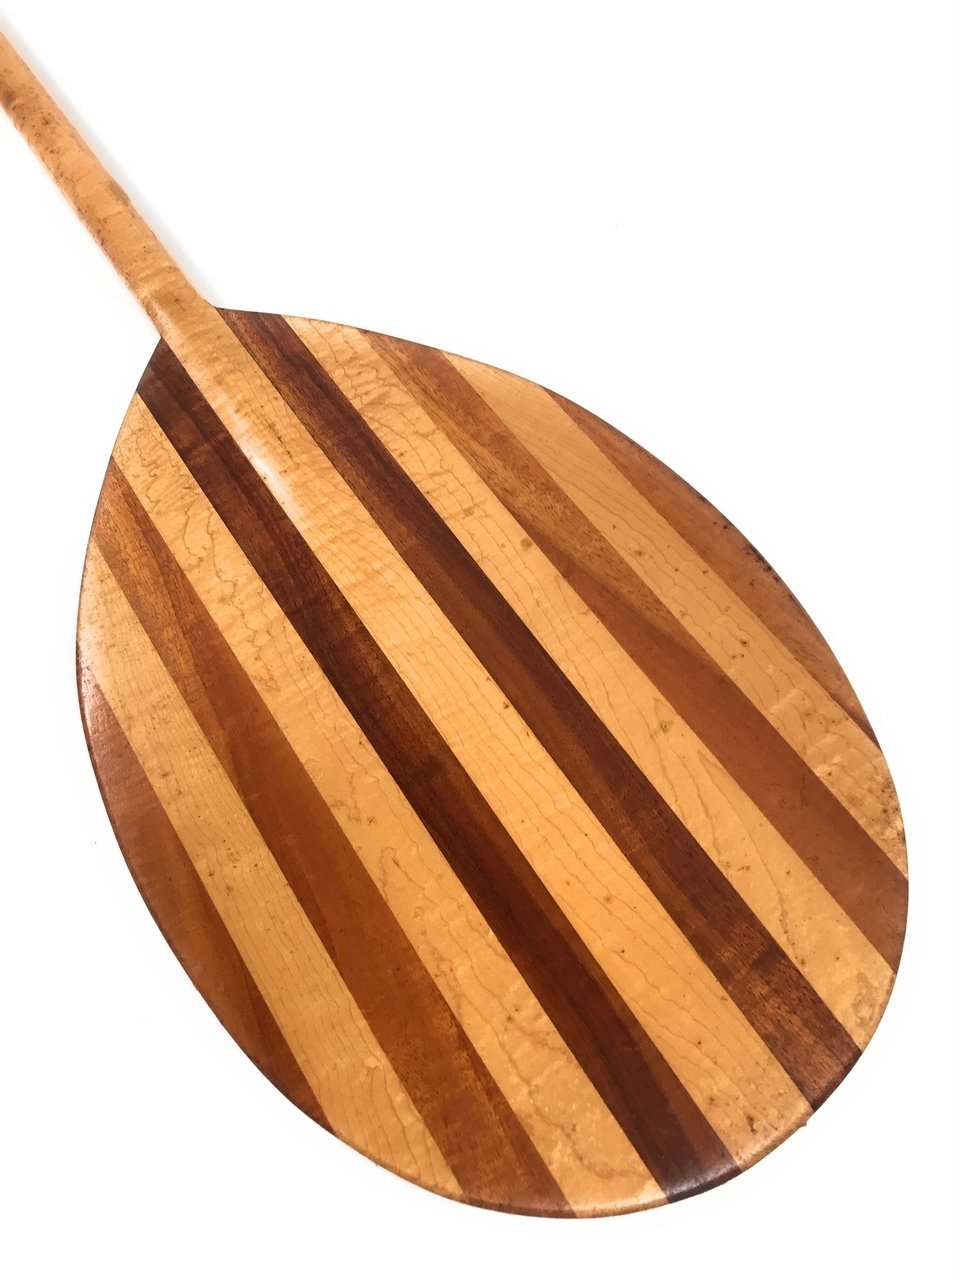 Koa Paddle 60'' w/ Maple Inlays - Made in Hawaii - | #KOAM013